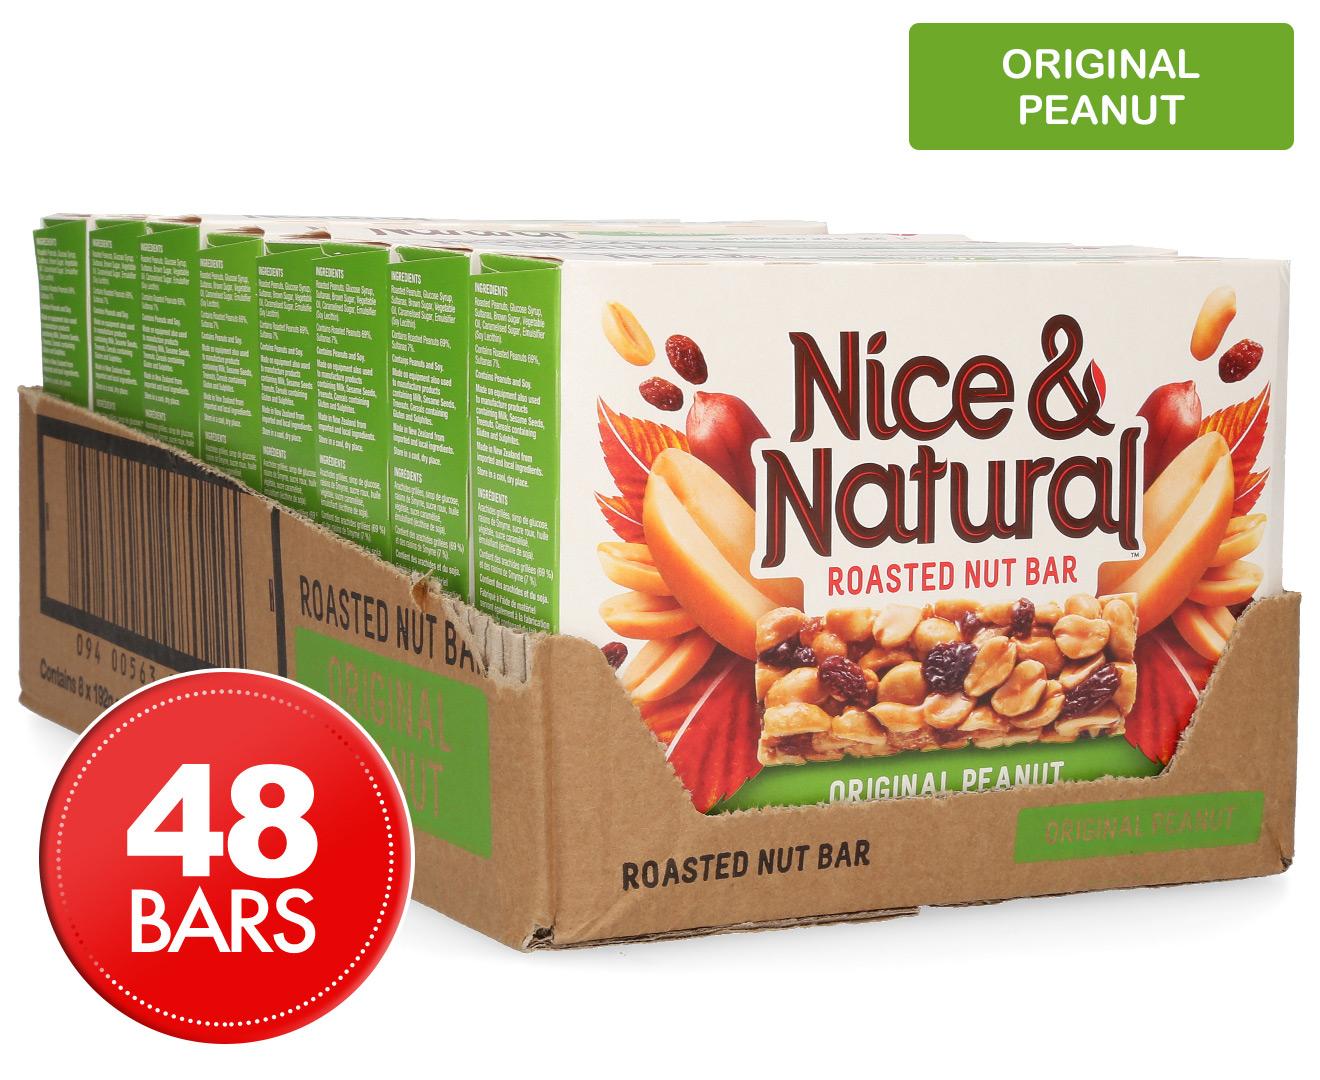 8 X Nice & Natural Roasted Nut Bar Original Peanut 192g